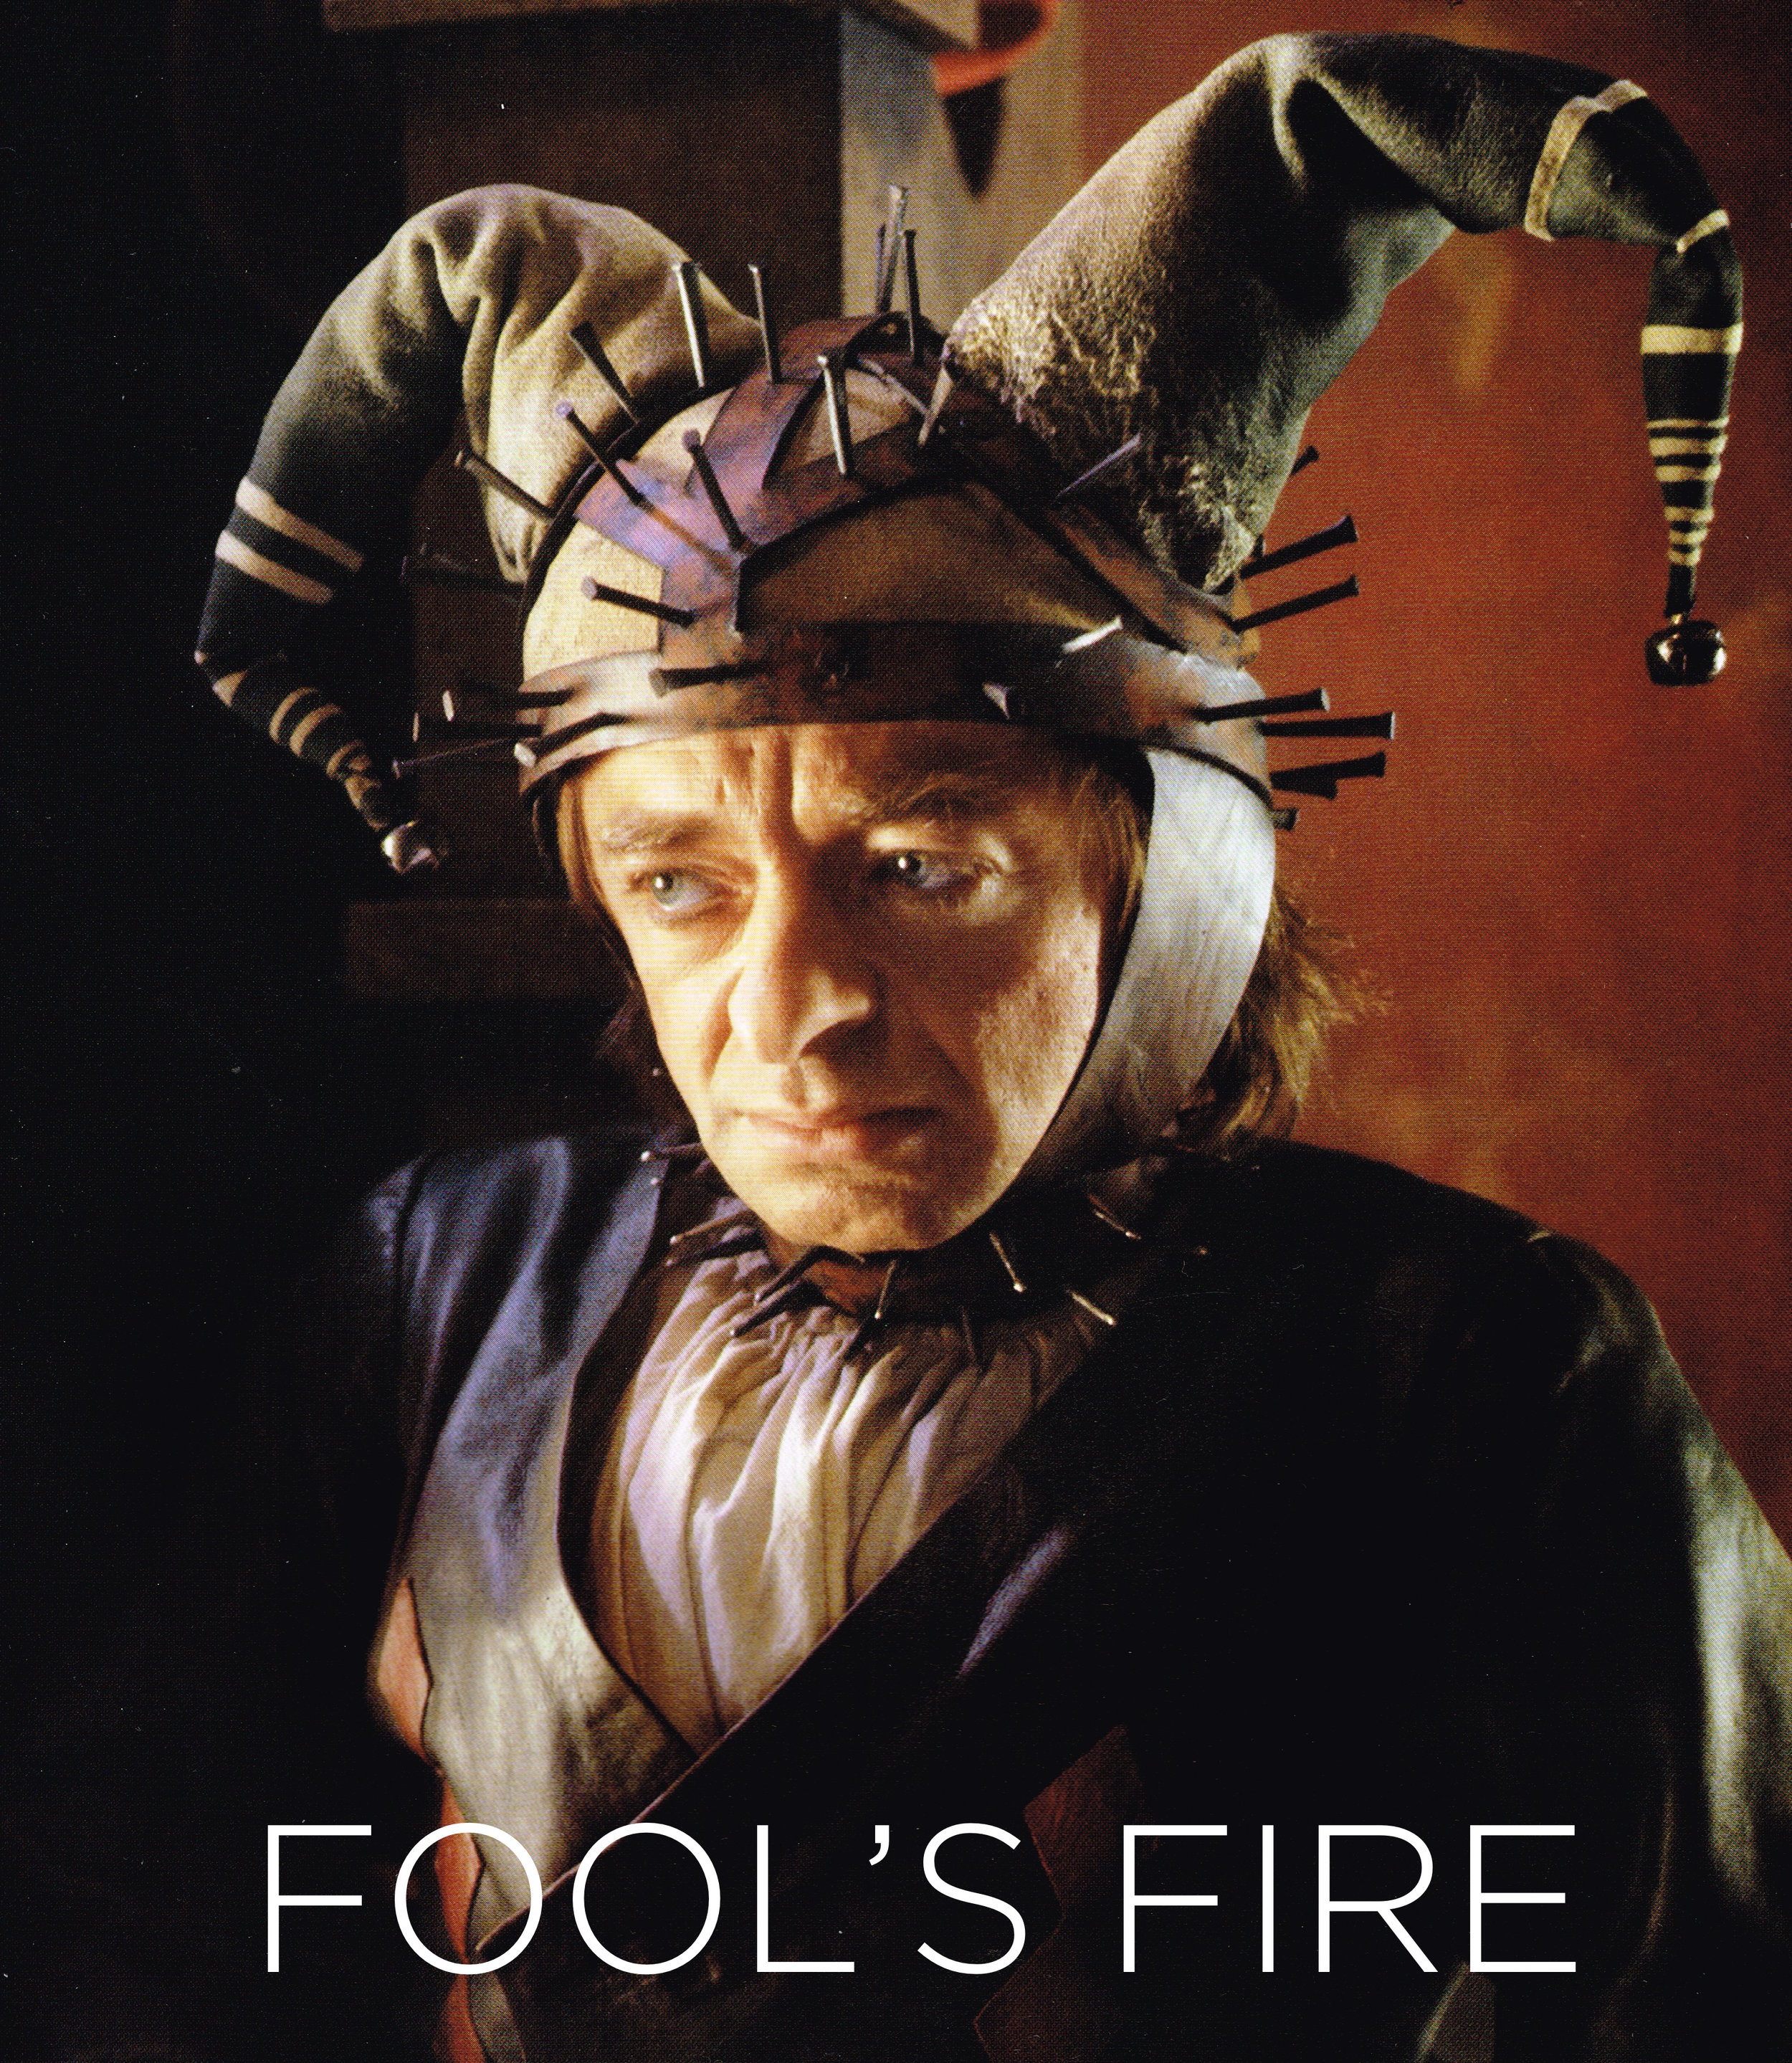 Fool's Fire 1 1 copy.jpg